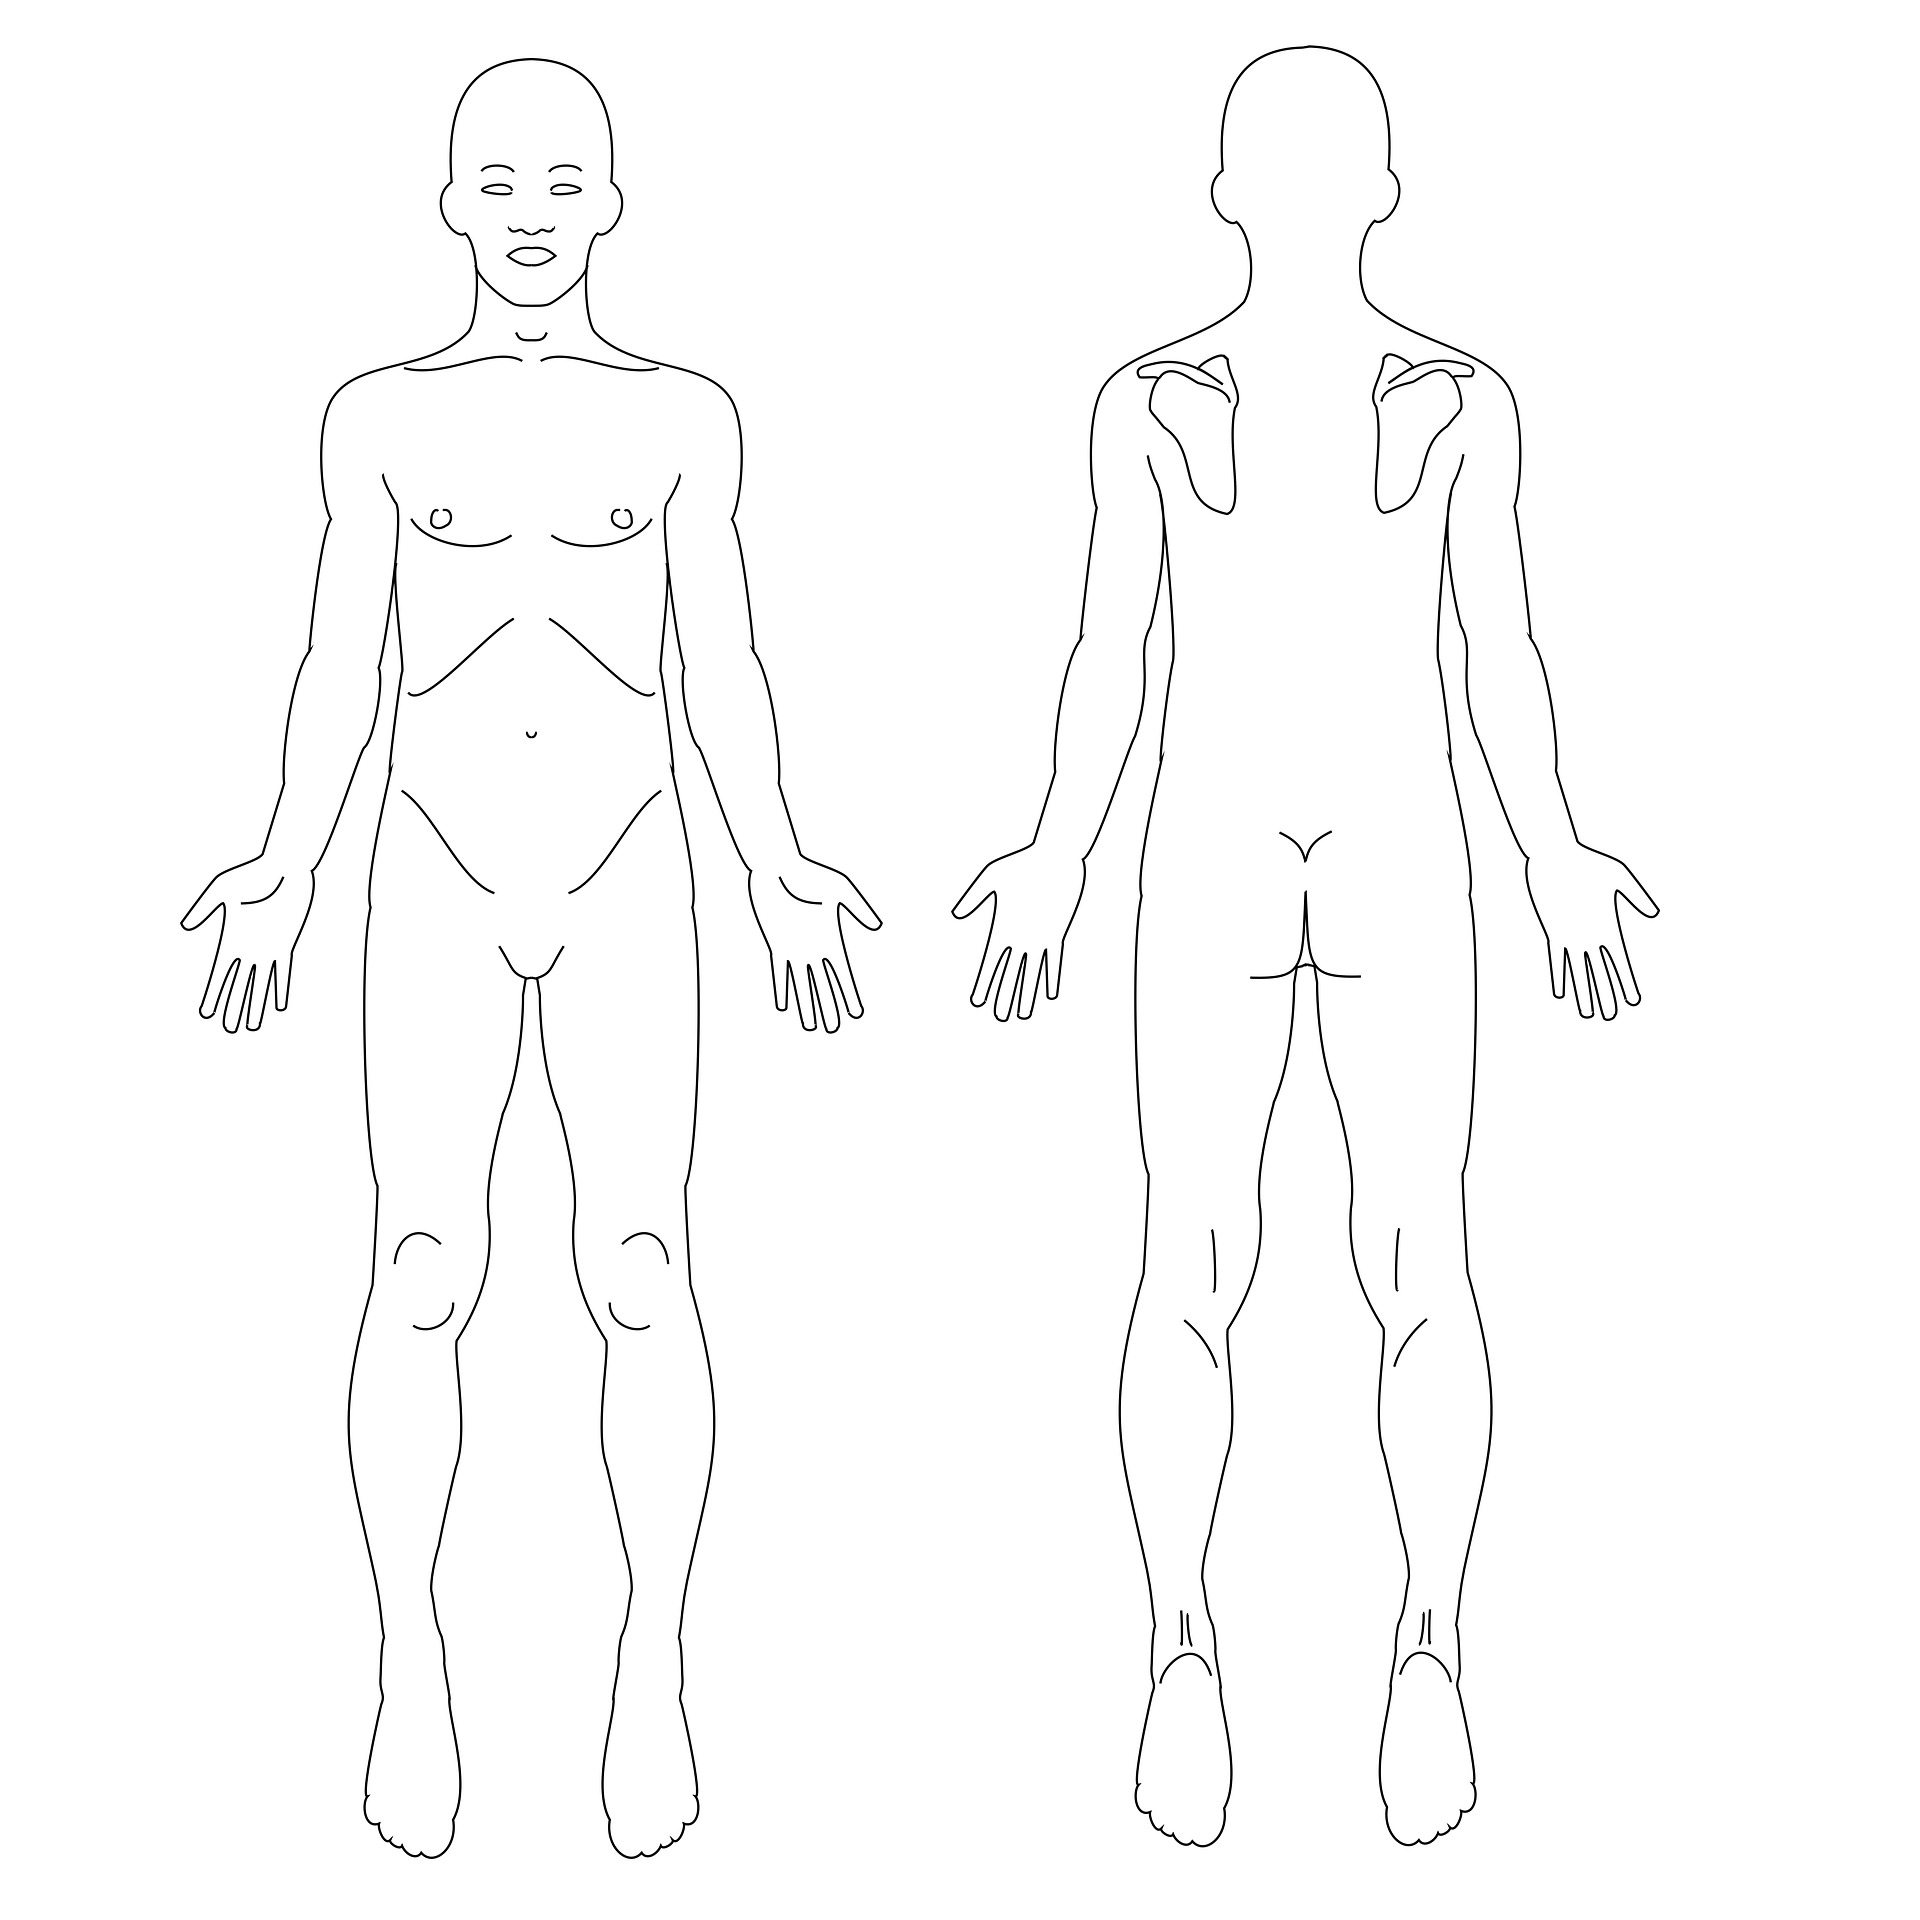 Licensed under CC0 https://www.maxpixel.net/Male-Fig-Anatomy-Human-Body-Males-1859518